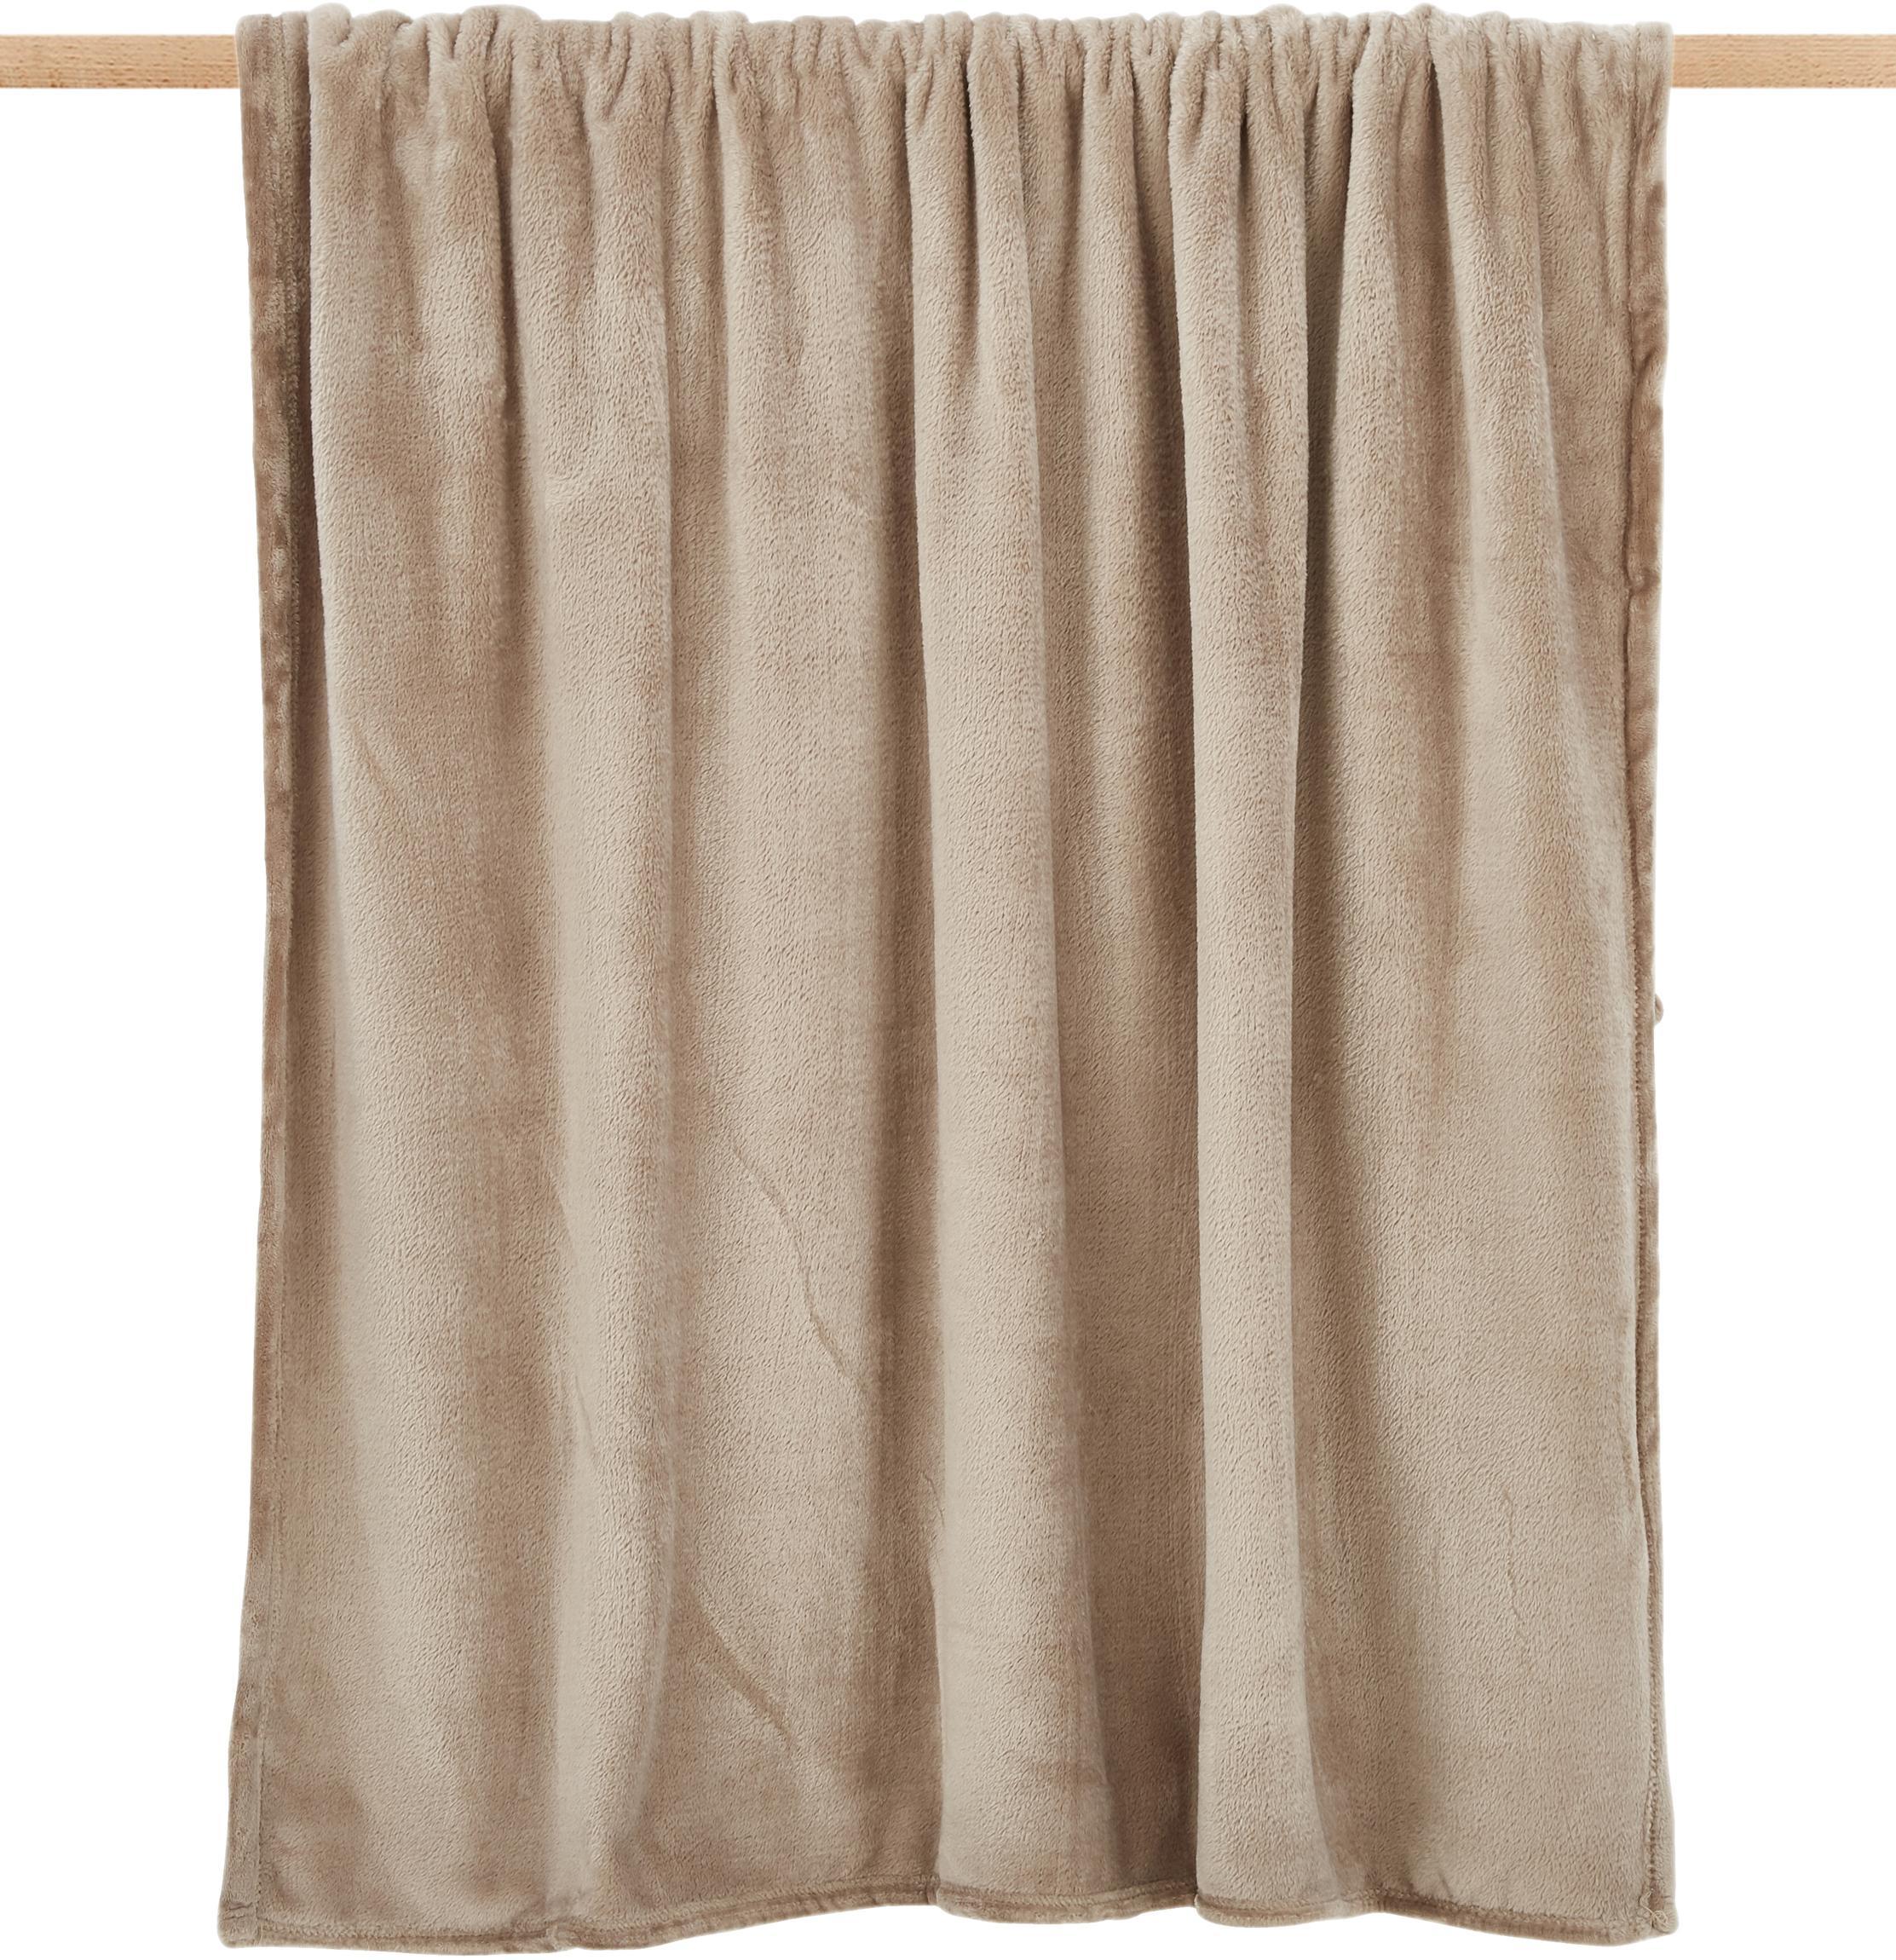 Manta suave de tela polar Doudou, Poliéster, Gris claro, An 130 x L 160 cm